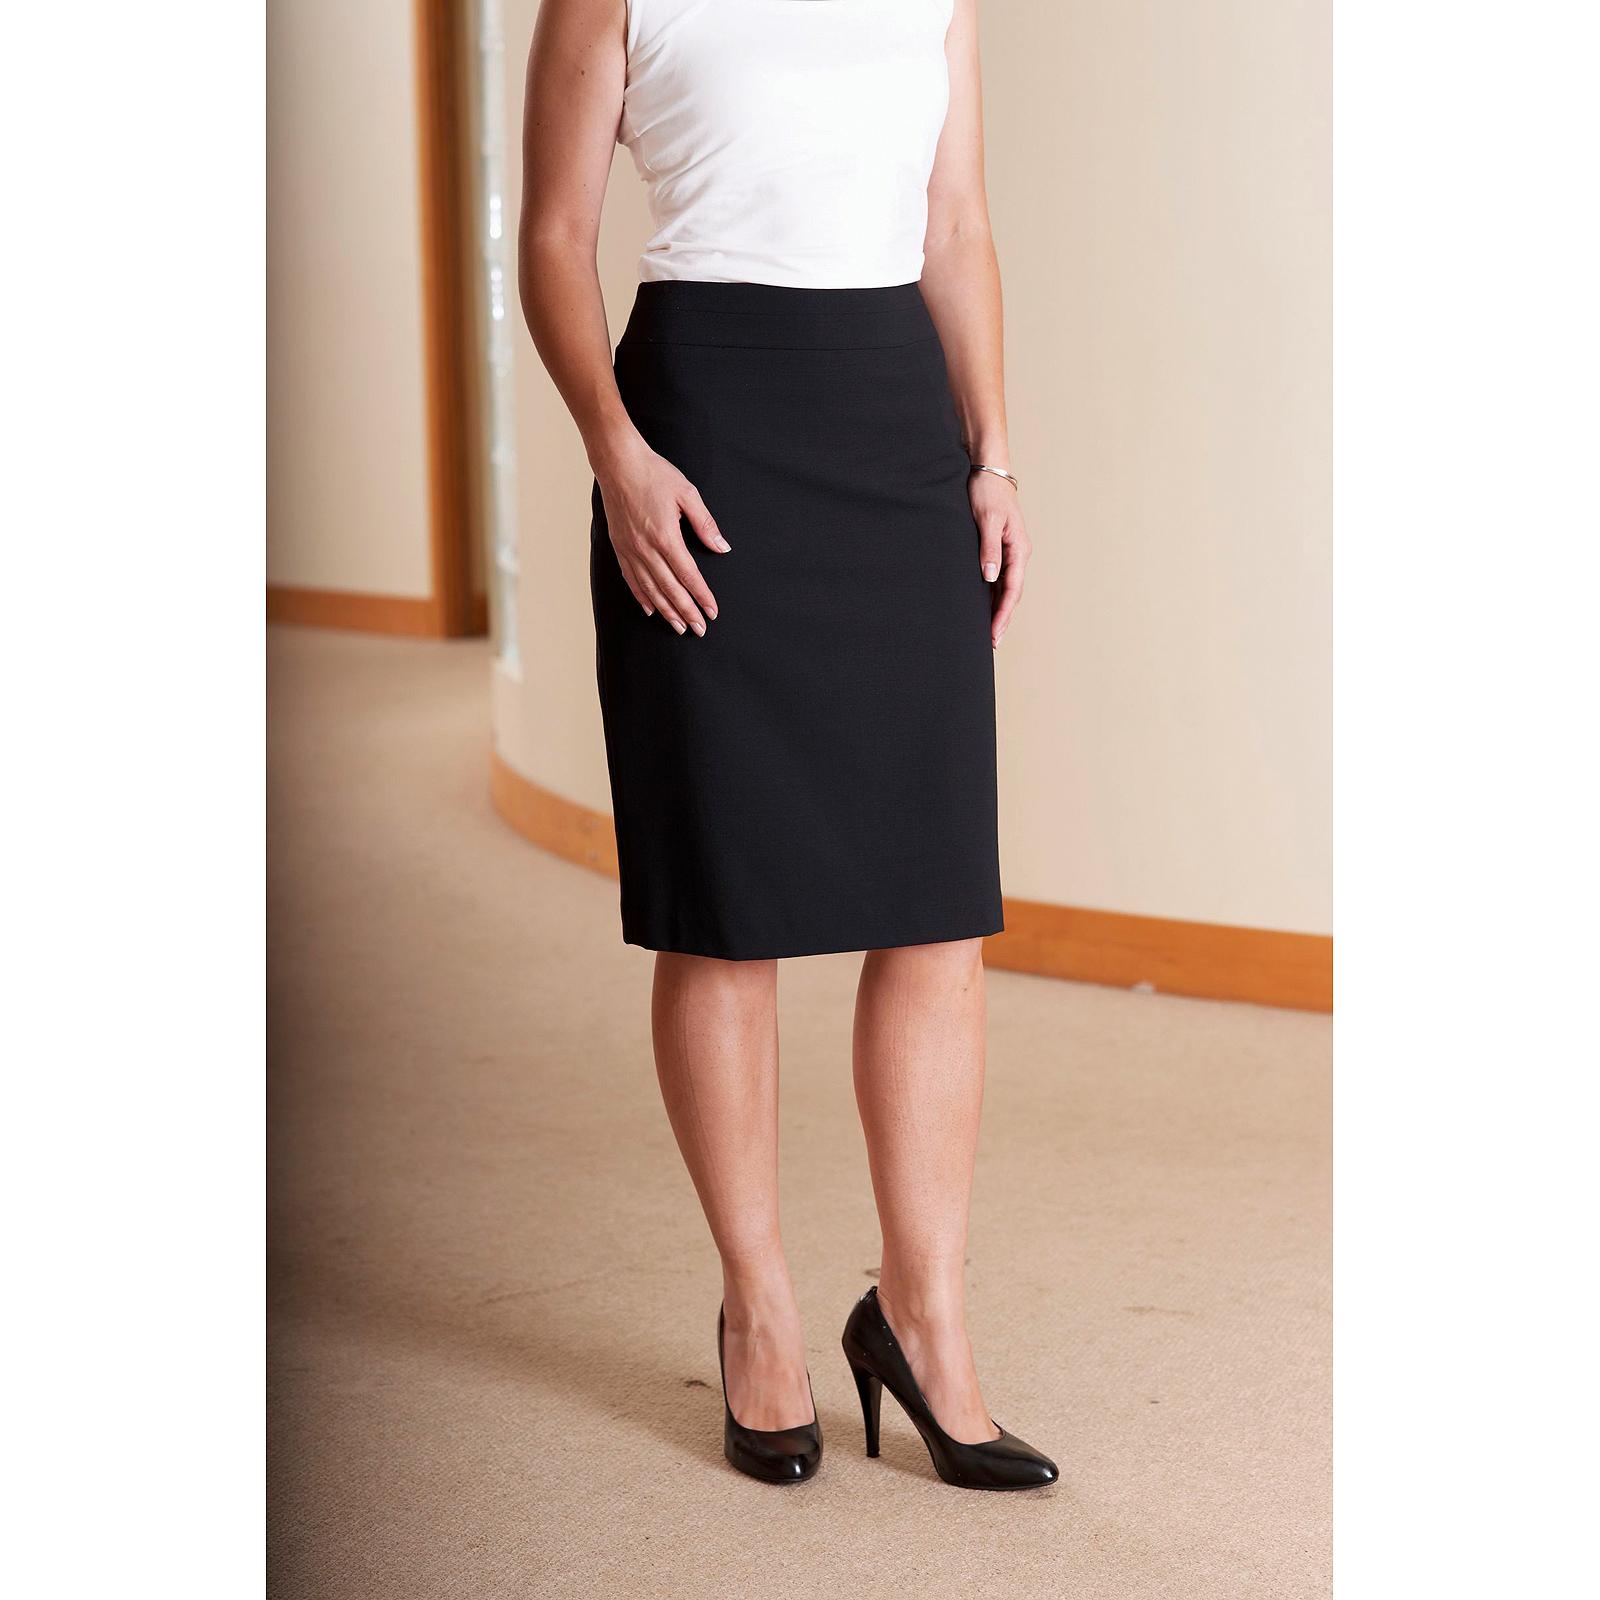 Skopes Marie Skirt Womens Las Formal Office Work